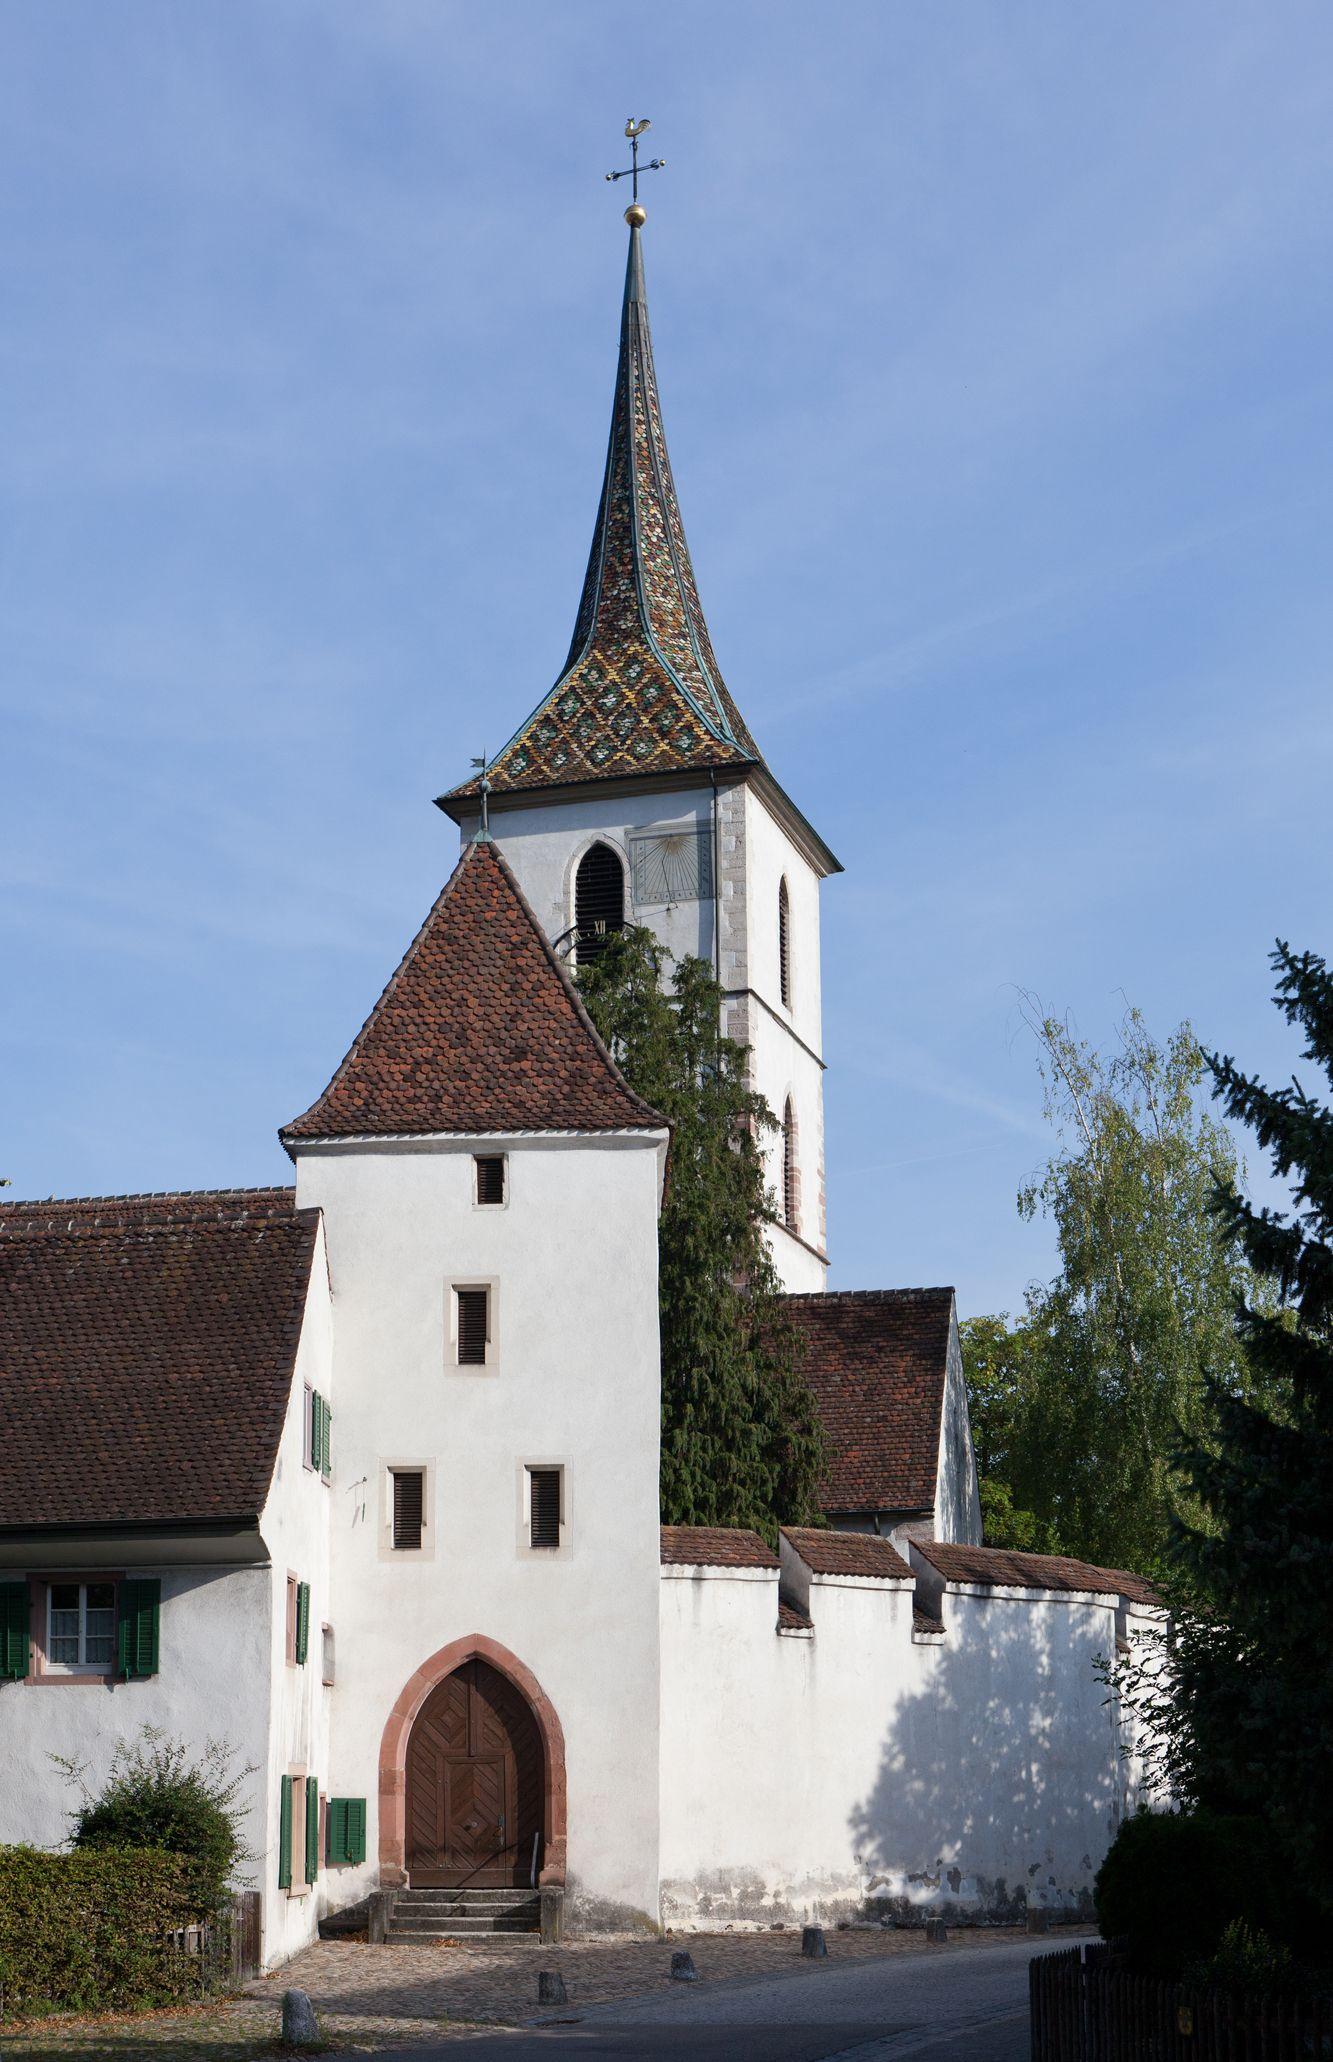 Muttenz Switzerland  city photo : Muttenz | Churches and Chapels Switzerland 3 A | Pinterest